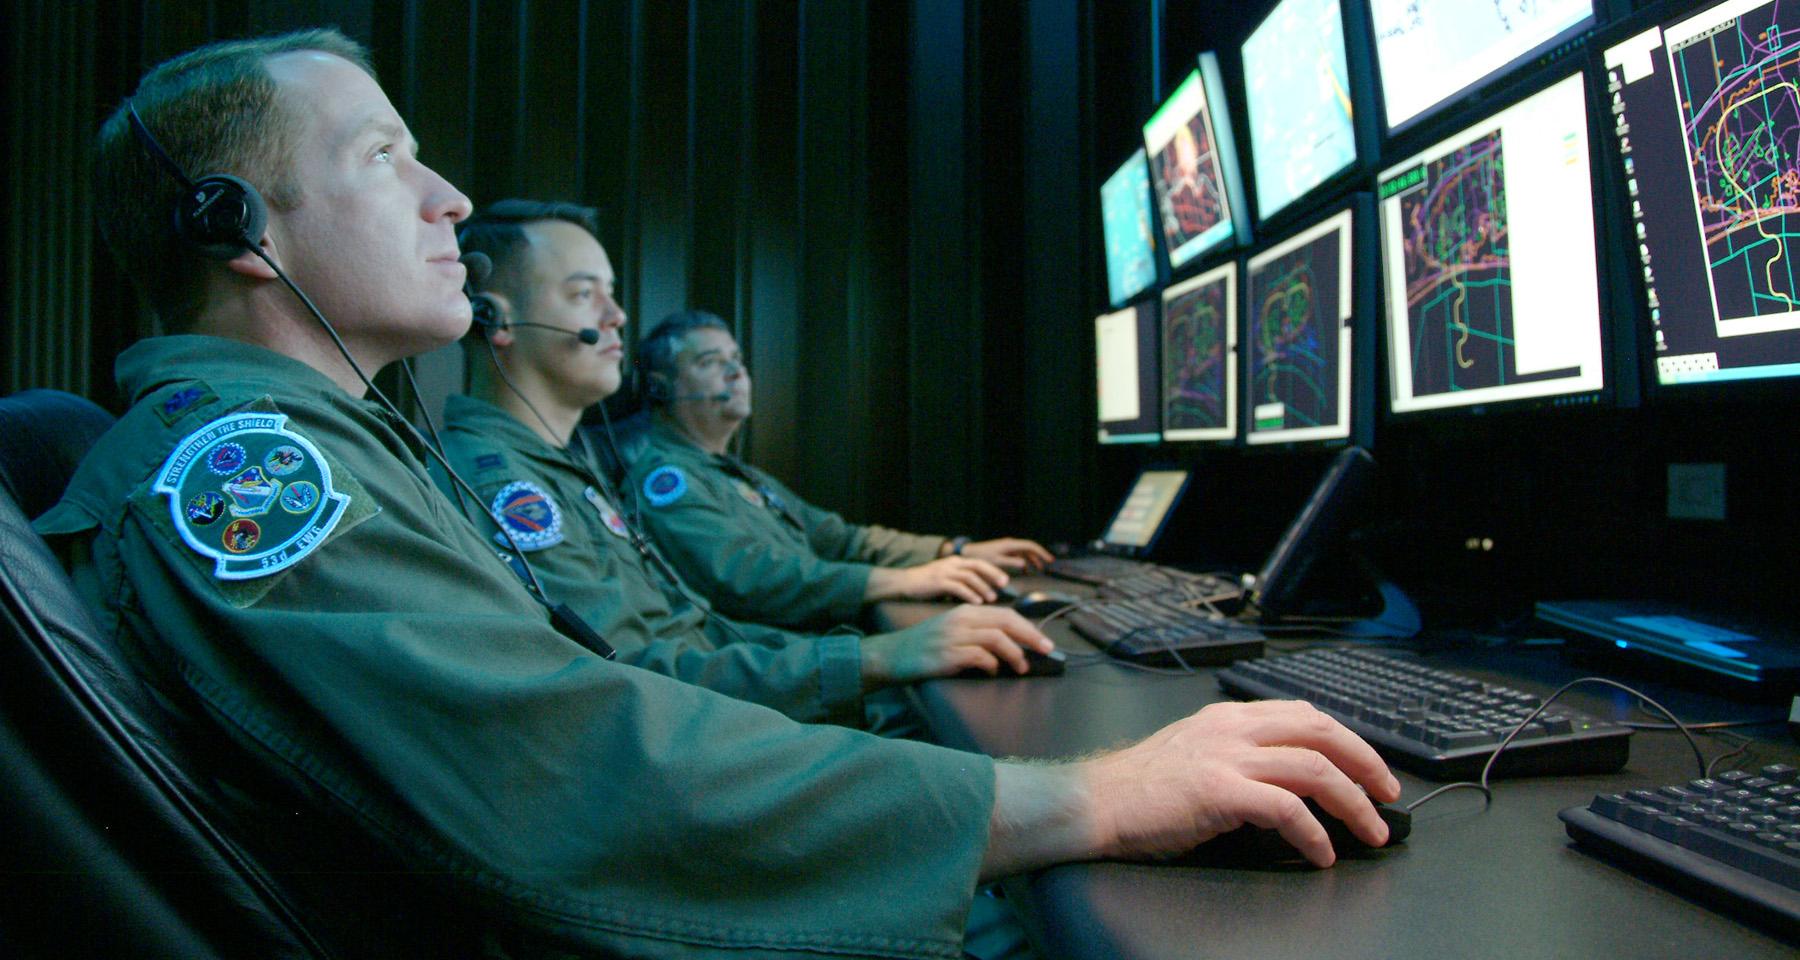 Understanding The Militarized Internet